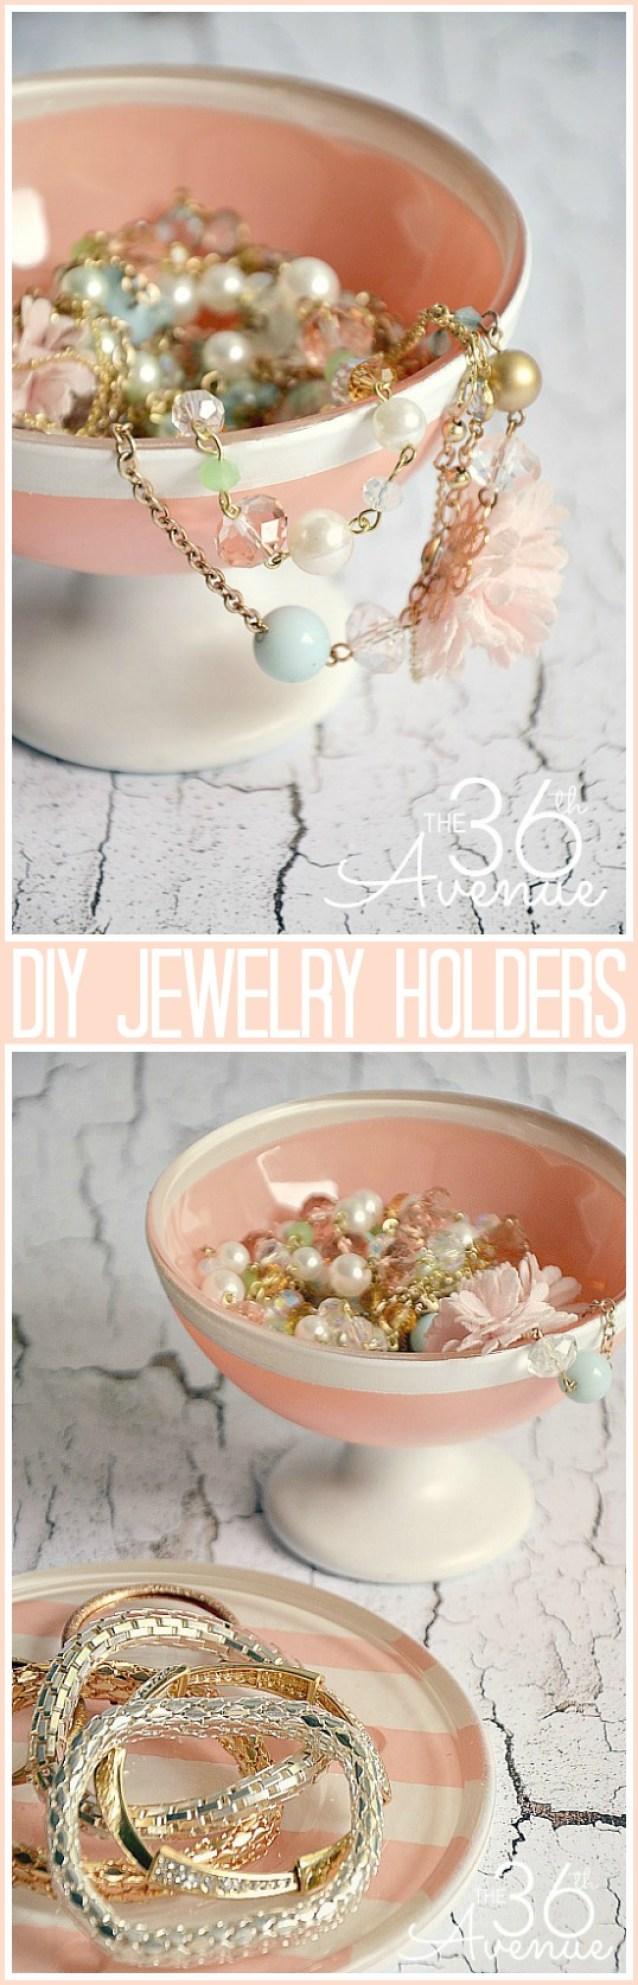 Jewelry-Holder-21